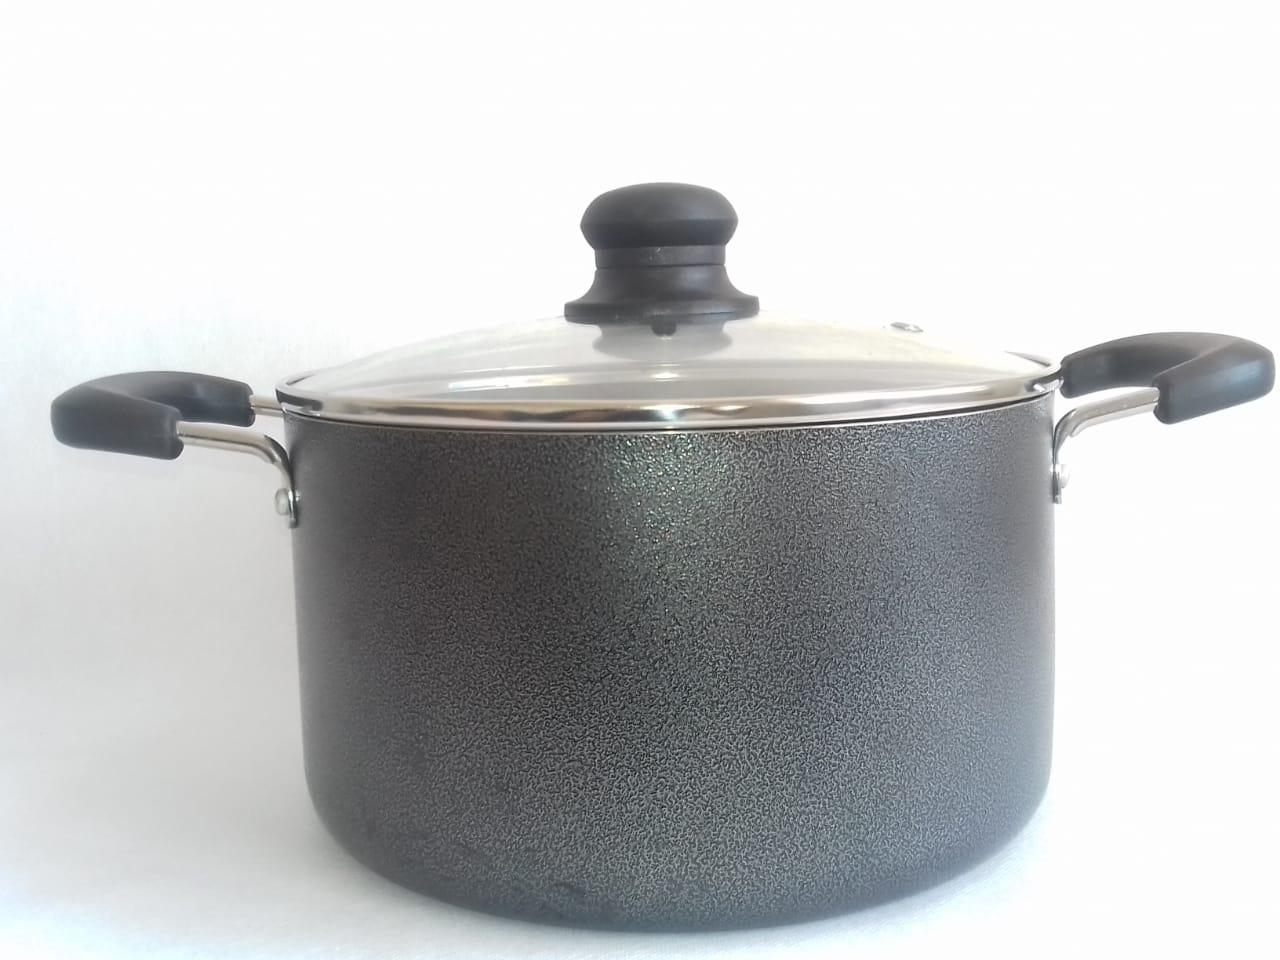 Ikea Casserole Pots Price In Sri Lanka Ikea Casserole Pots Emi Plans Daraz Lk